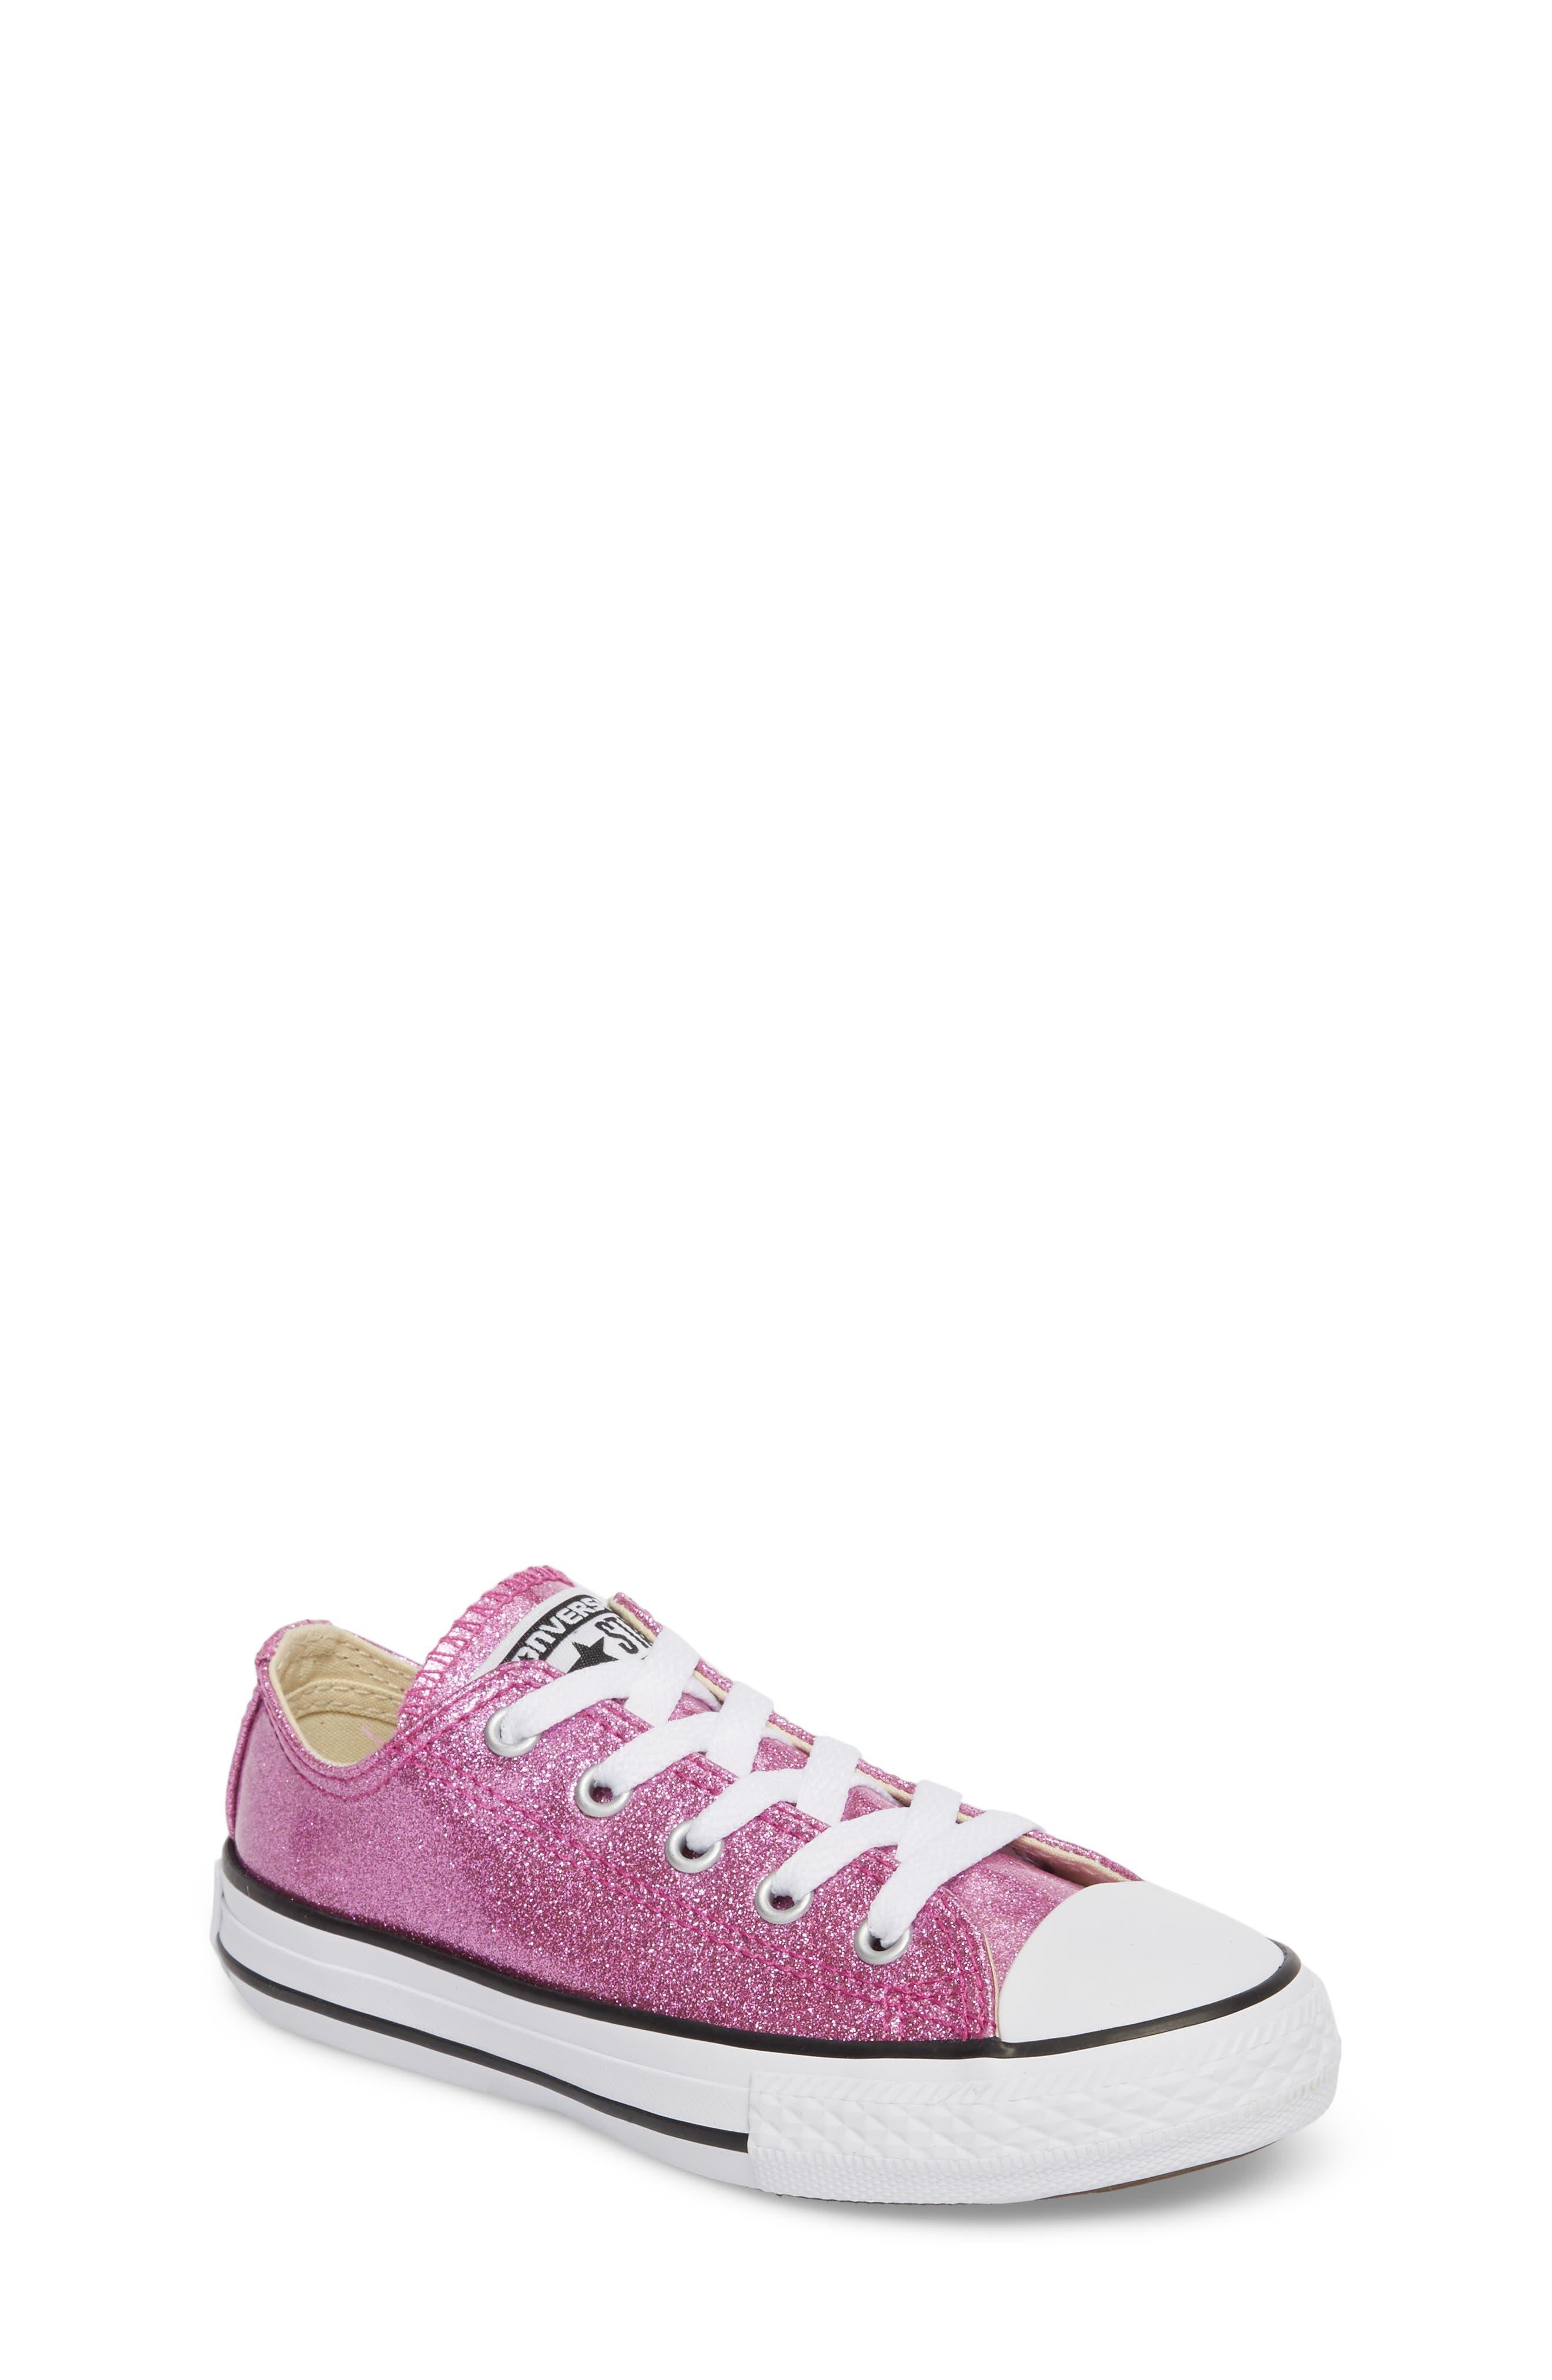 Converse All Star® Seasonal Glitter OX Low Top Sneaker (Toddler, Little Kid & Big Kid)